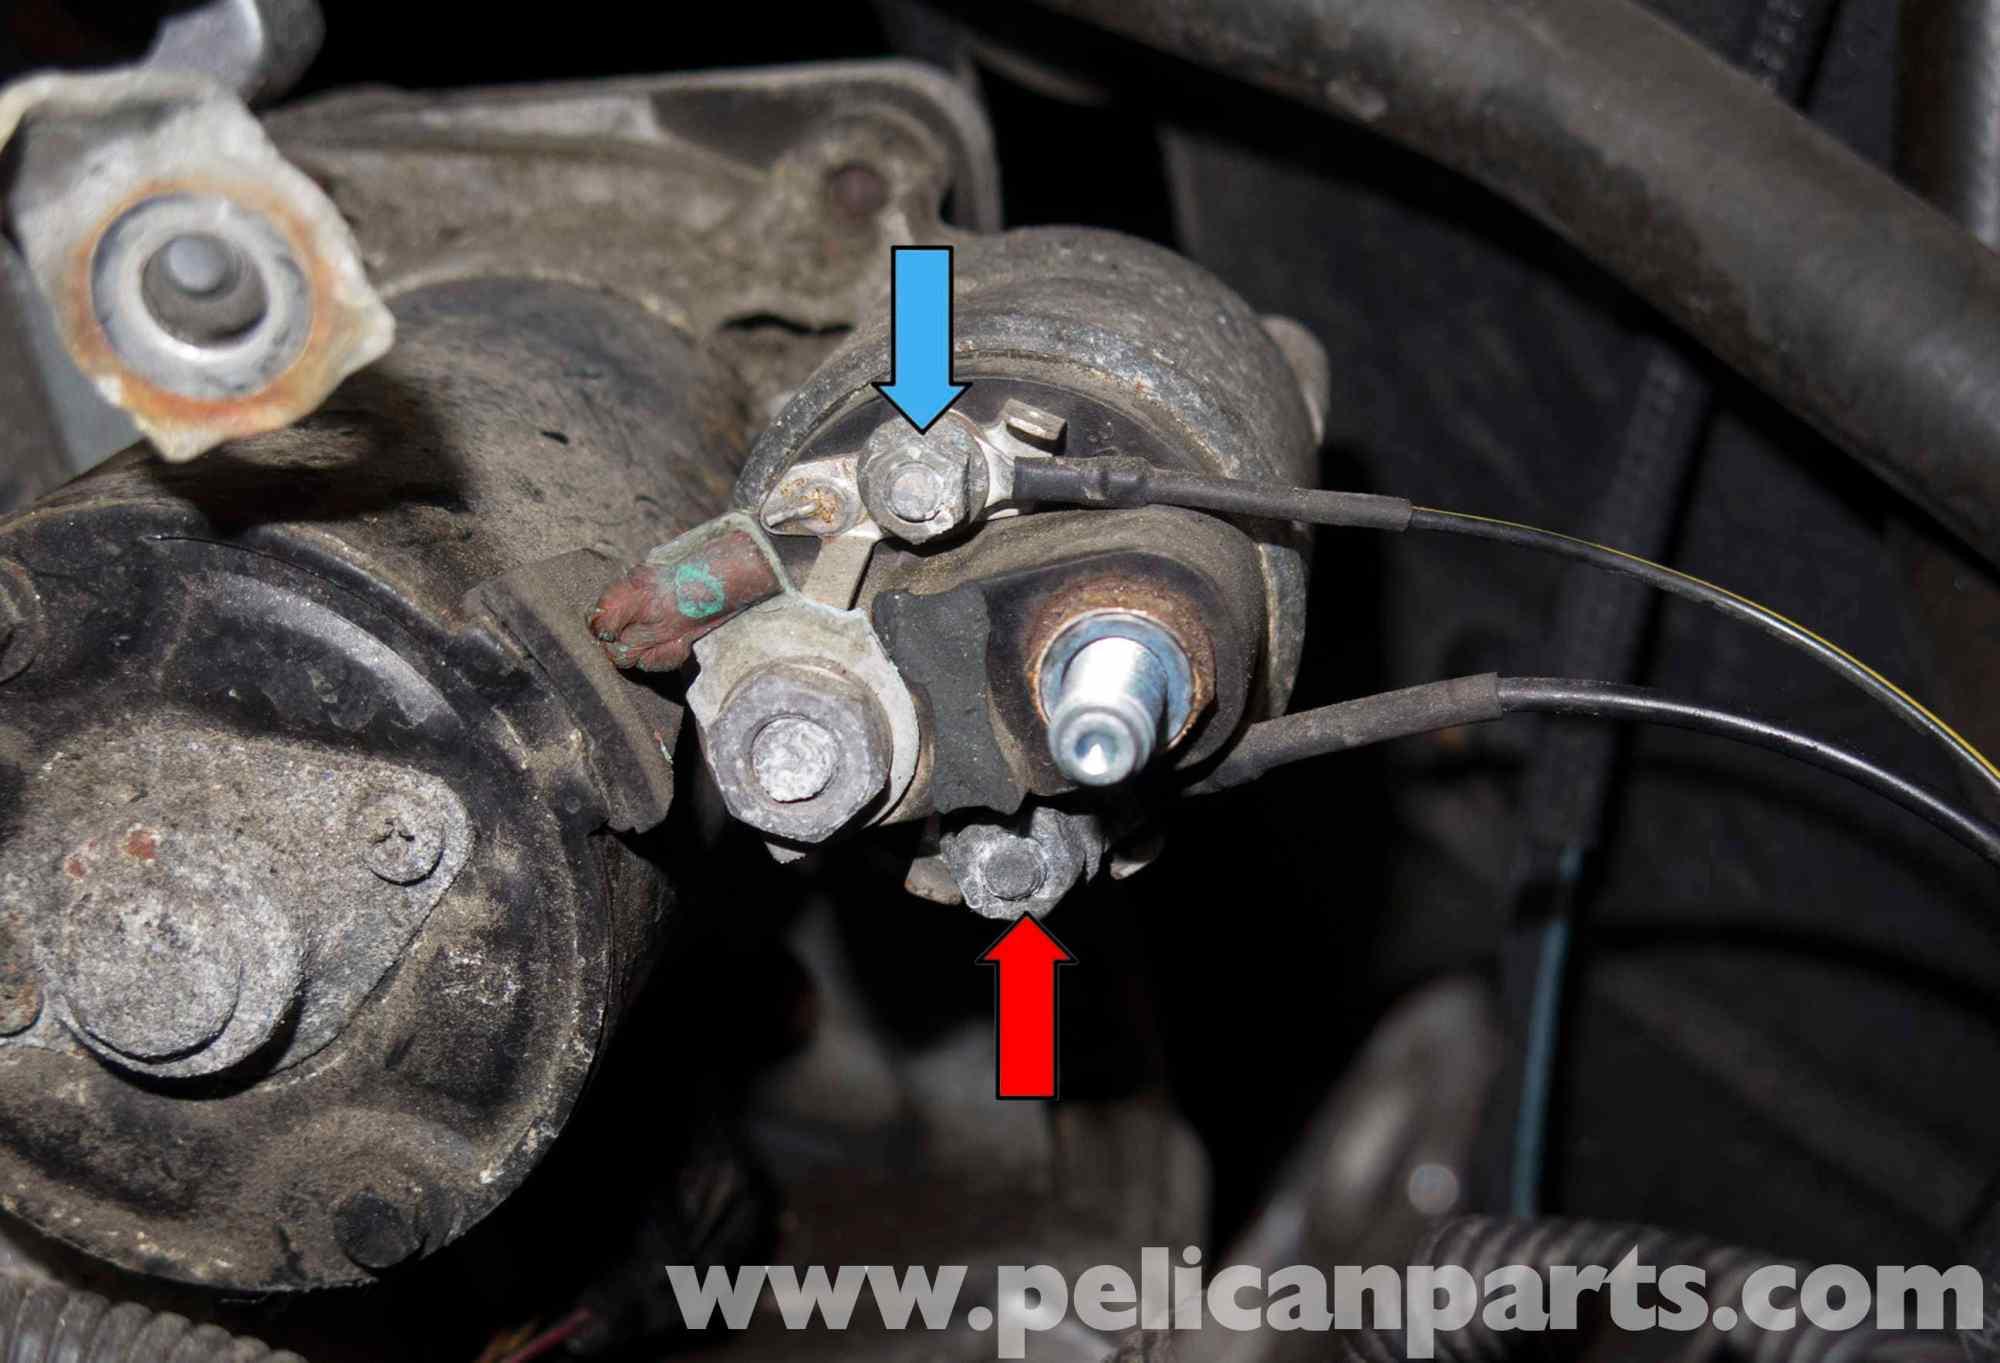 hight resolution of pelican technical article bmw x3 m54 6 cylinder engine starter 2004 bmw x3 starter wiring diagram 2004 bmw x3 starter wiring diagram